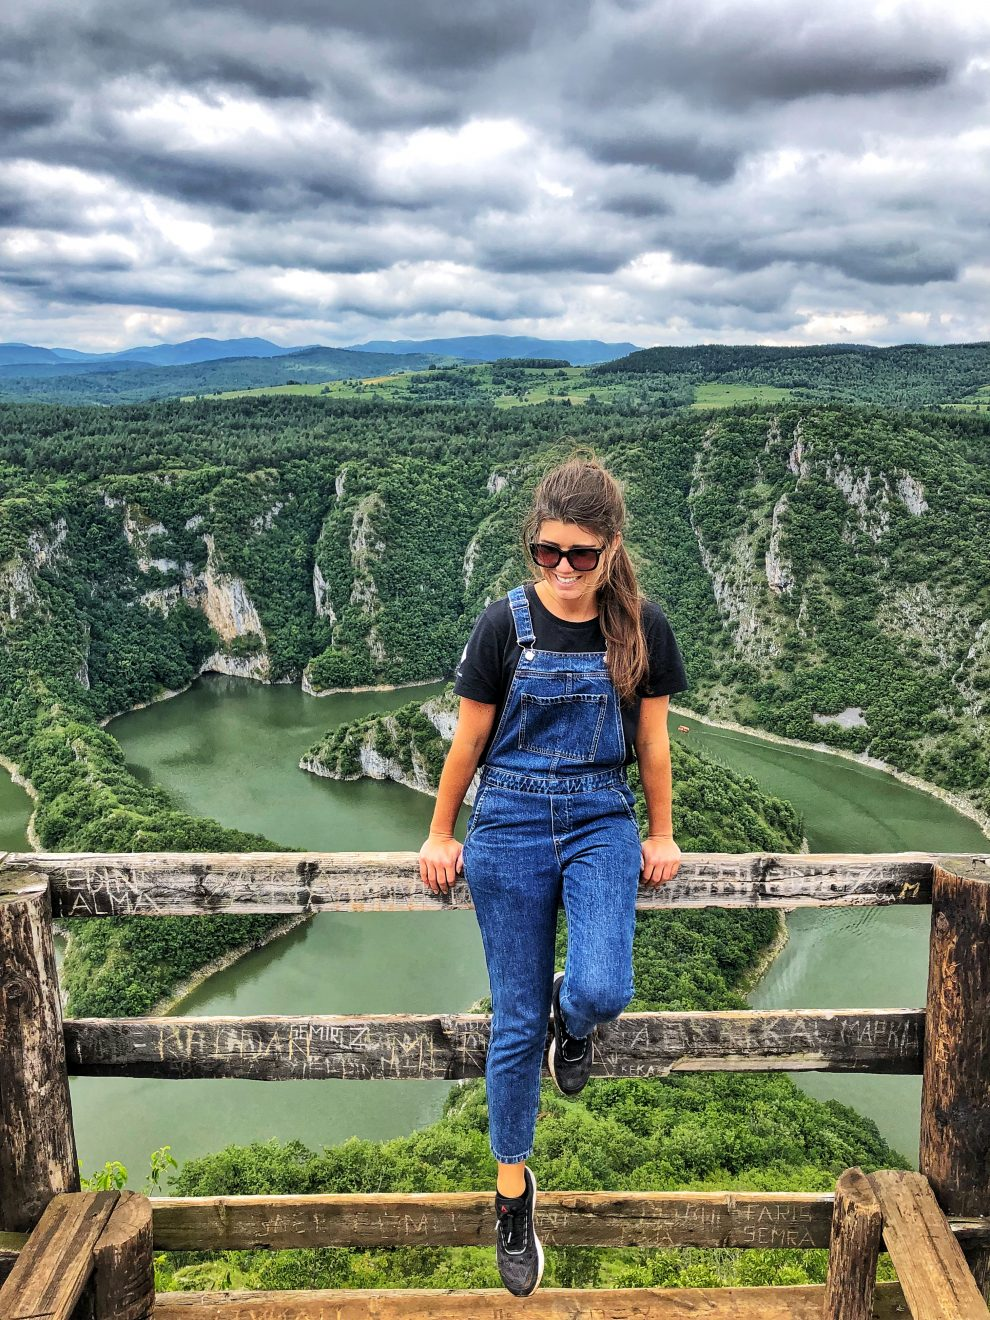 Balkan roadtrip - 3weekse reisroute - Uvac Canyon Servie - bezienswaardigheden dingen doen in Servie